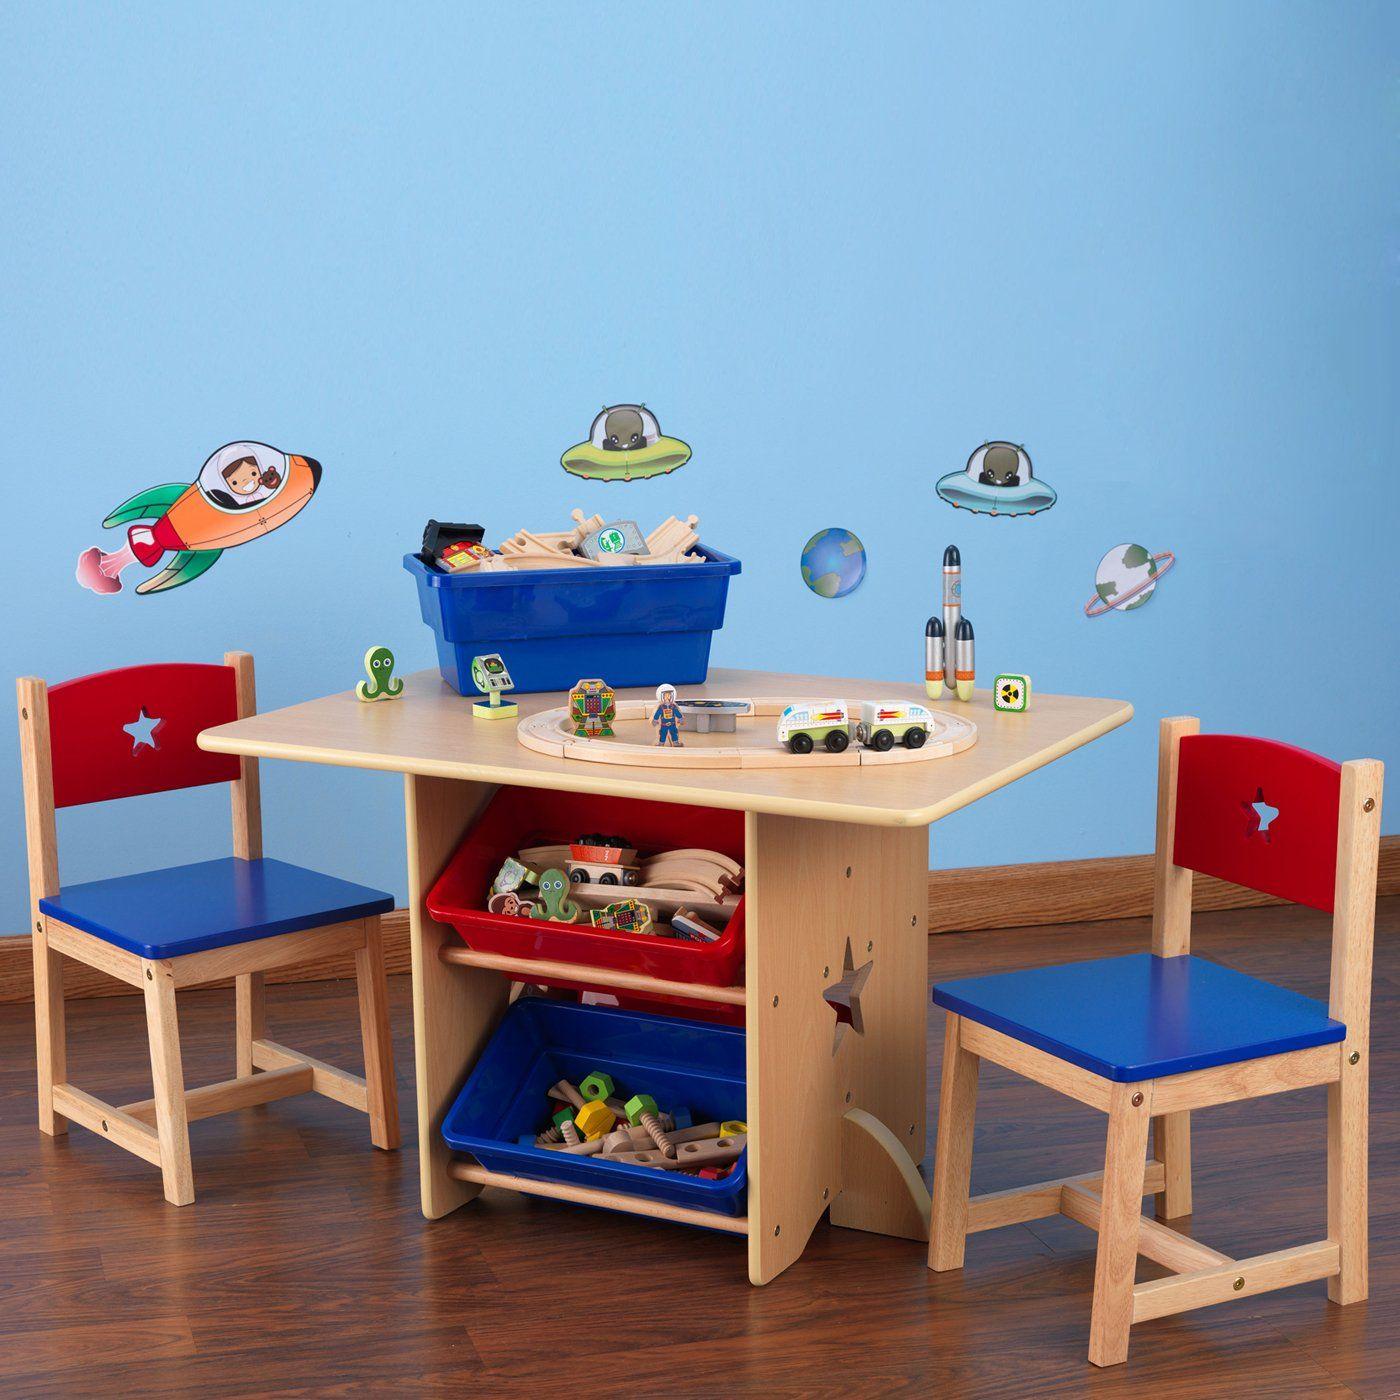 Kidkraft 26912 Star Kids Table & 2 Chair Set